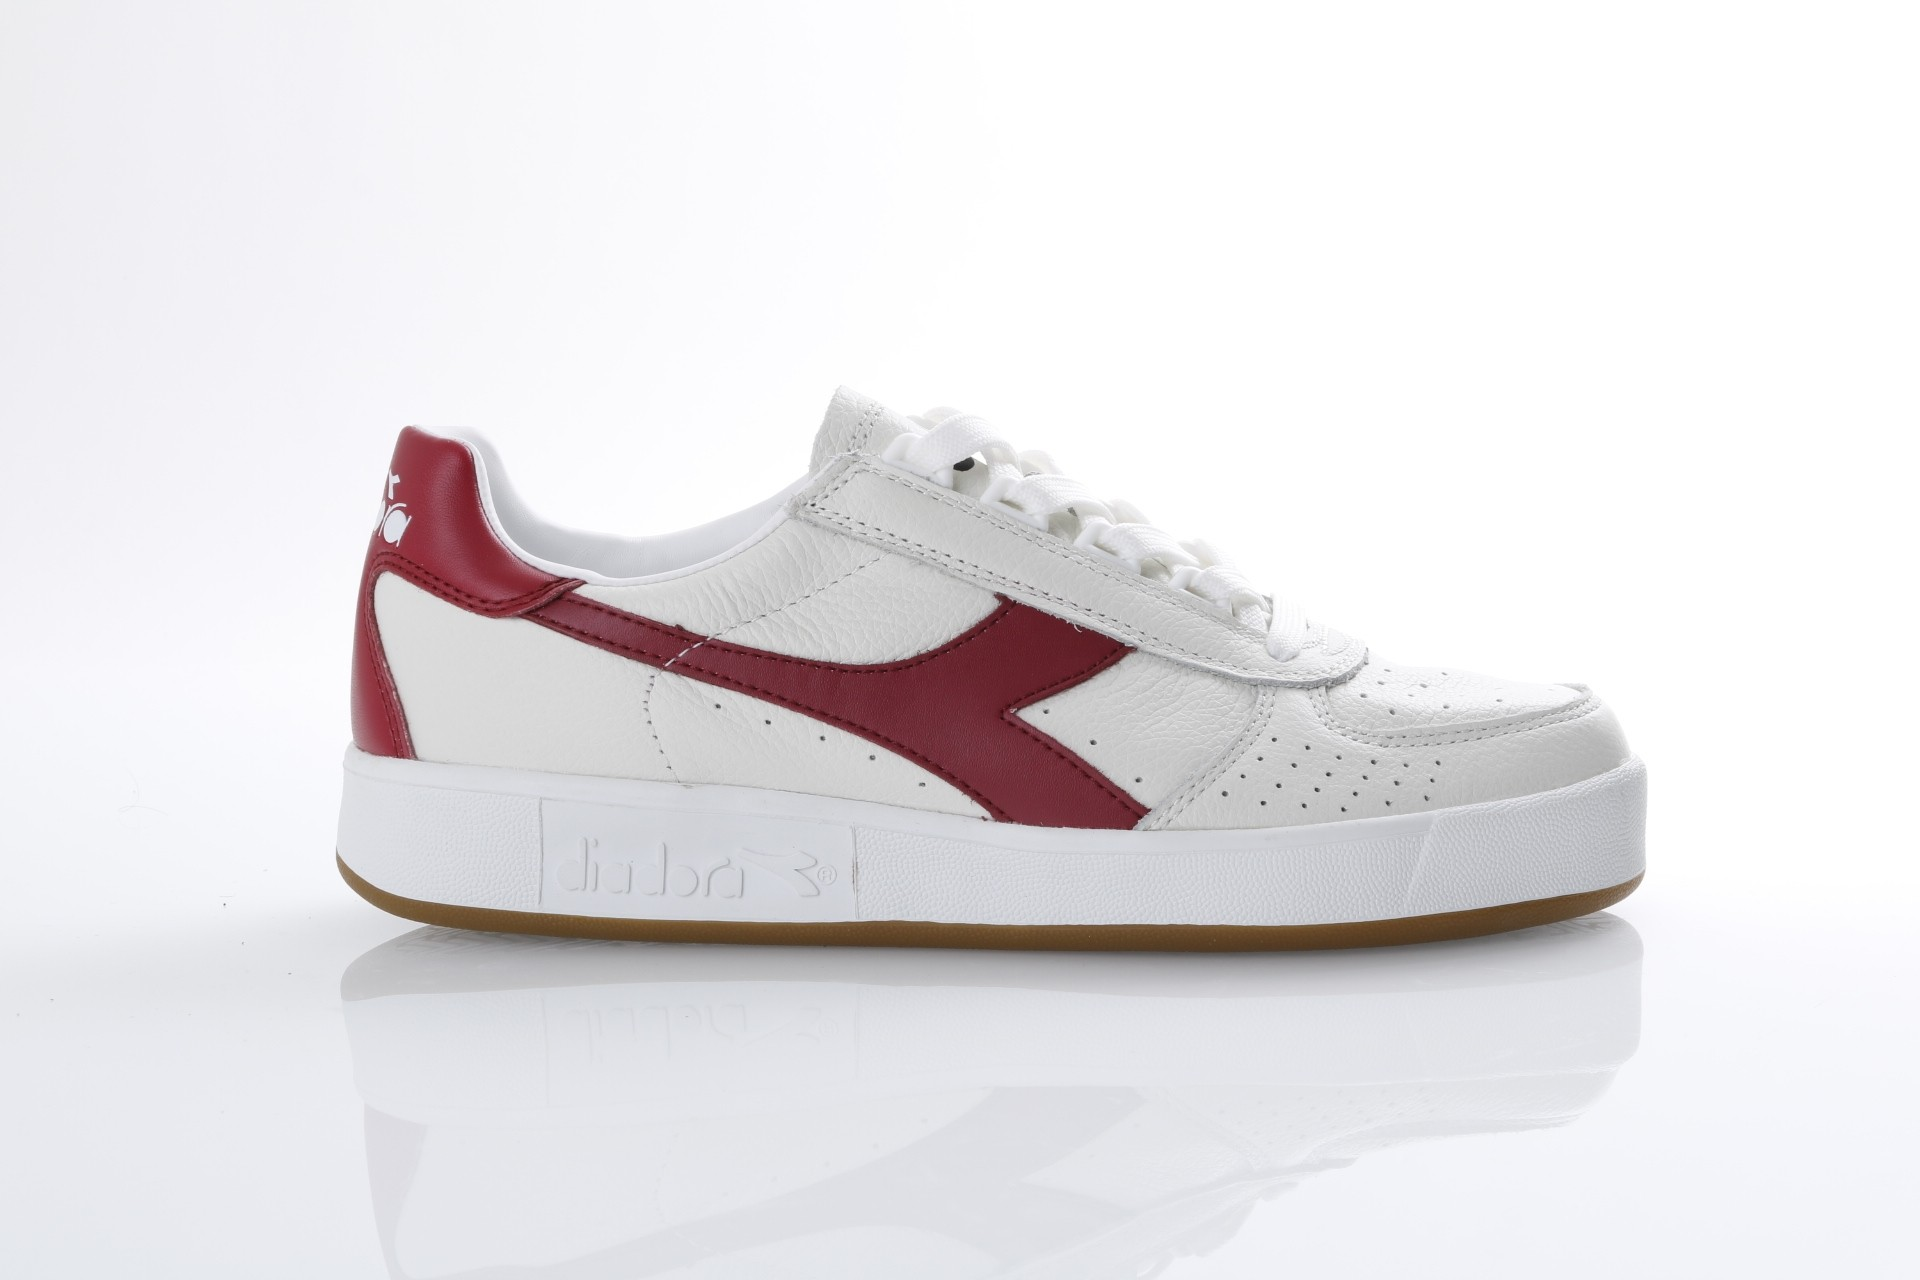 Foto van Diadora 501.173.090-C4620 Sneakers B elite 1 Wit